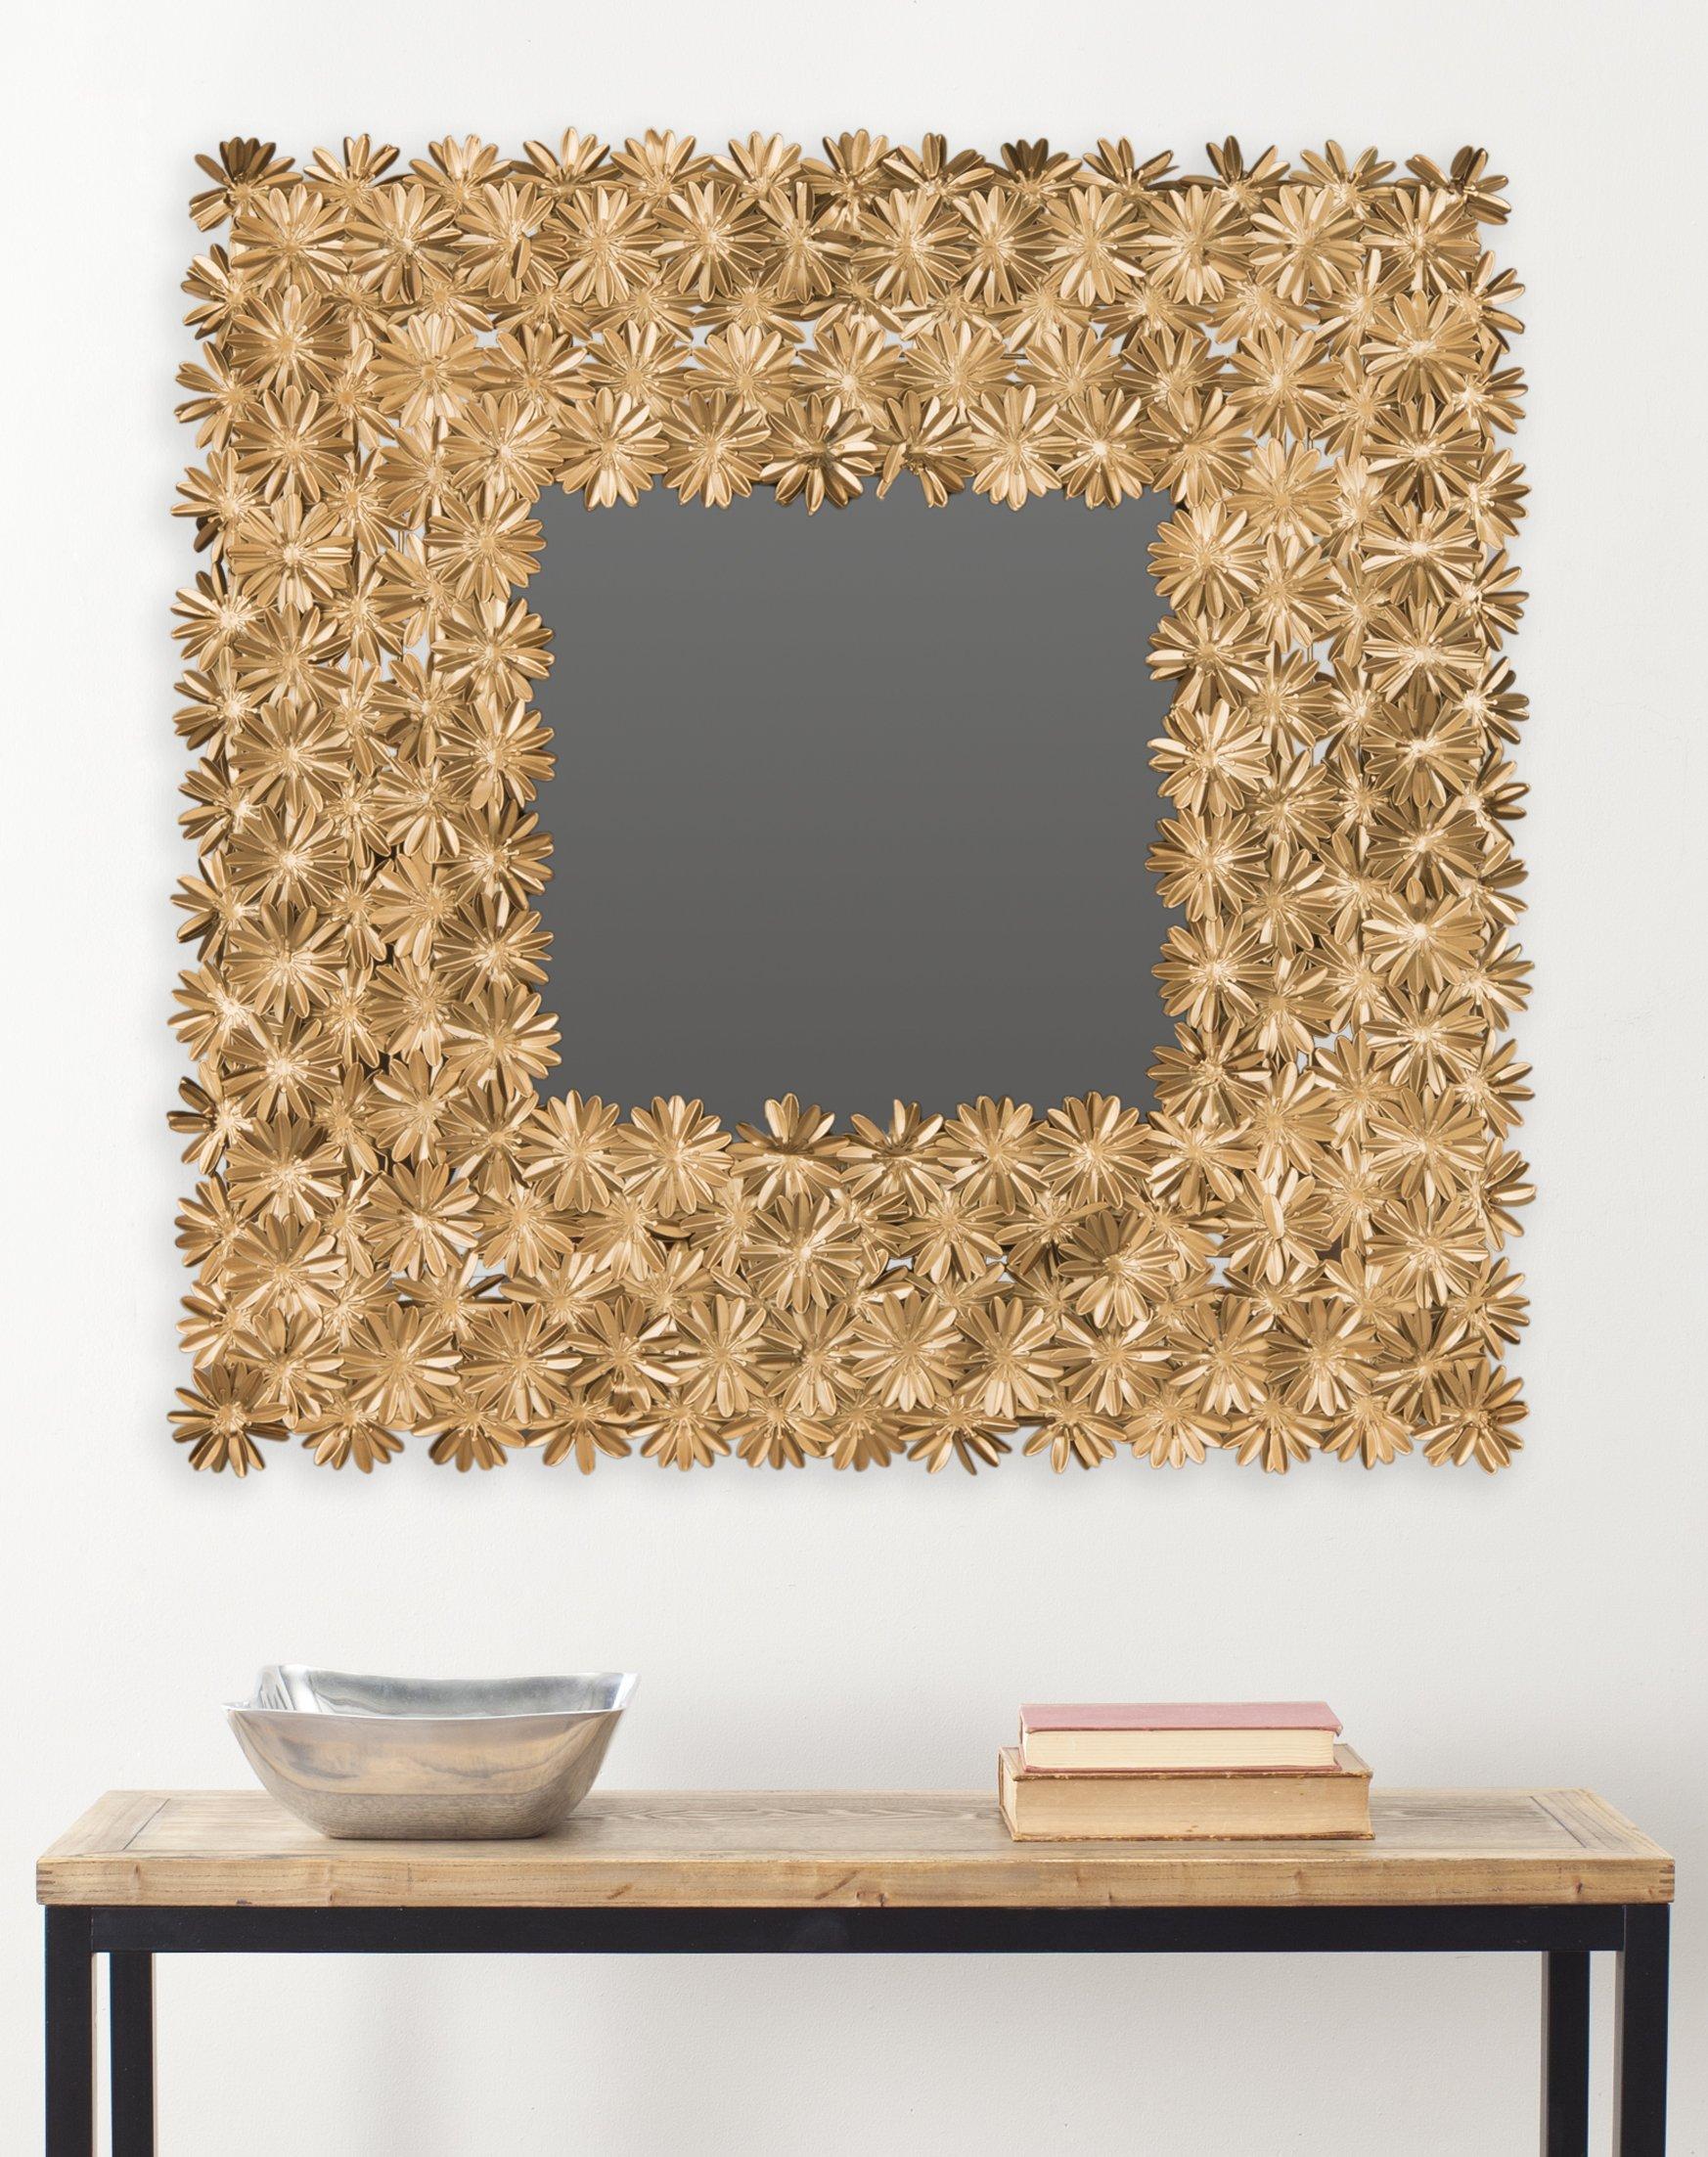 Safavieh MIR4055A Home Collection Crown Daisy Mirror, Antique Gold